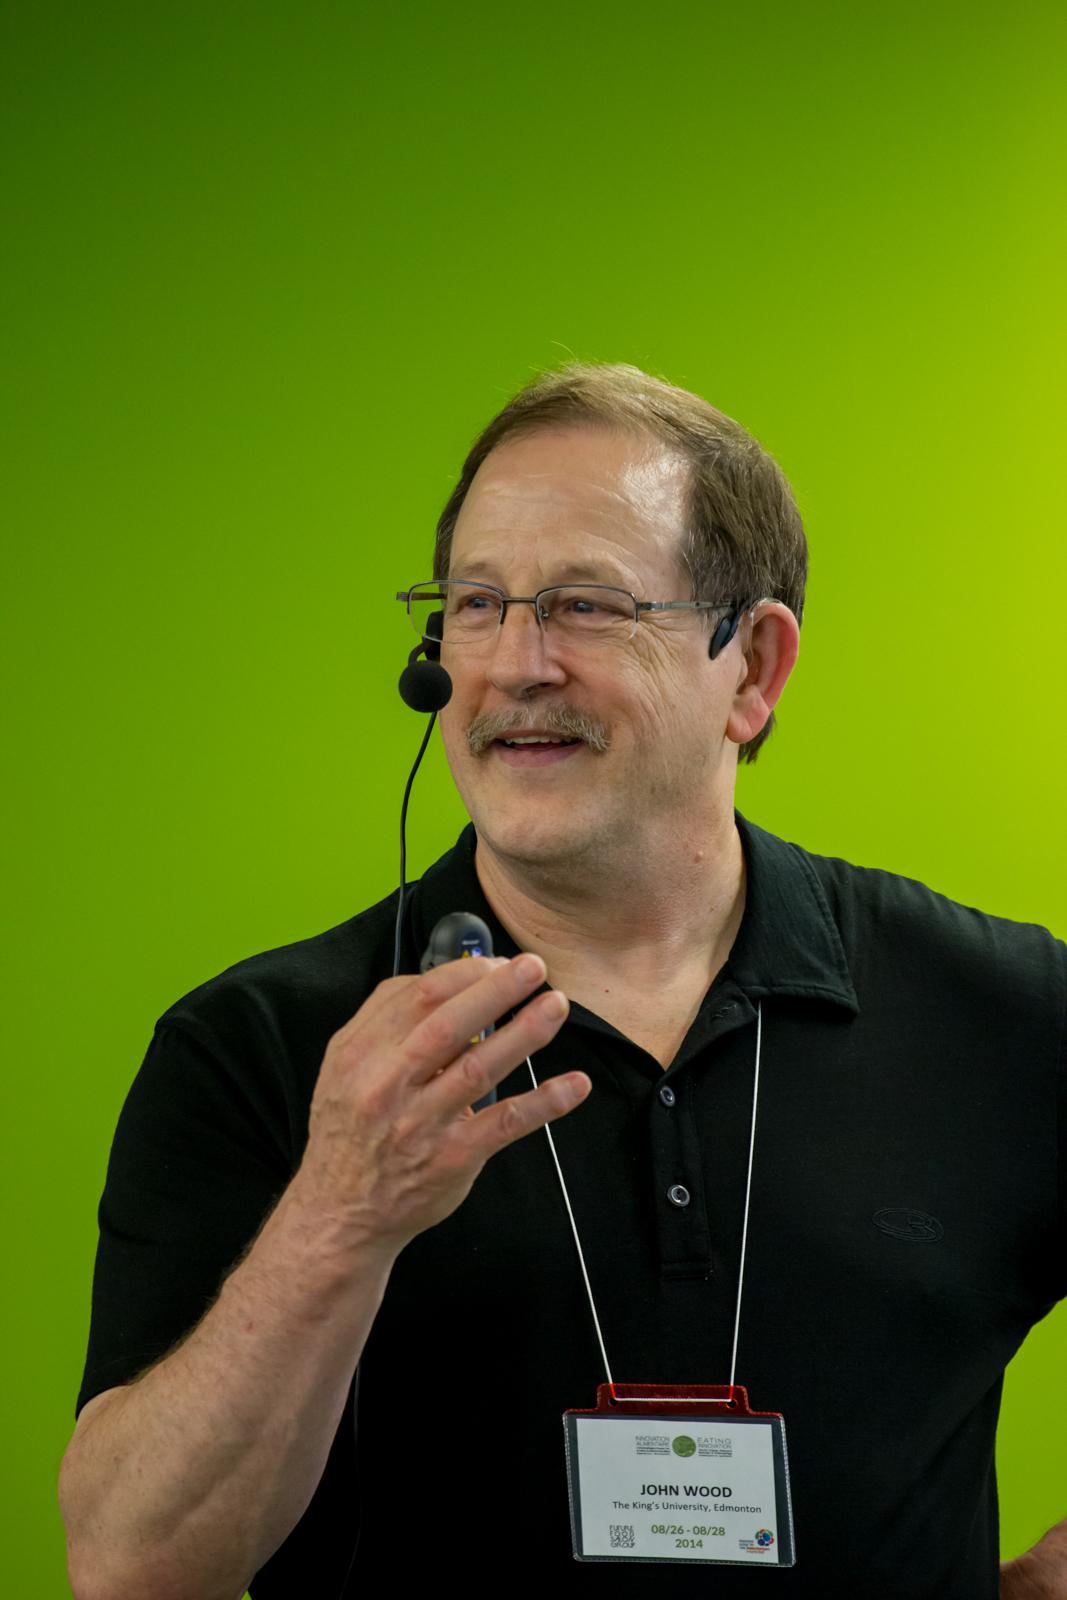 John Wood, Panel Eating Innovation 2014